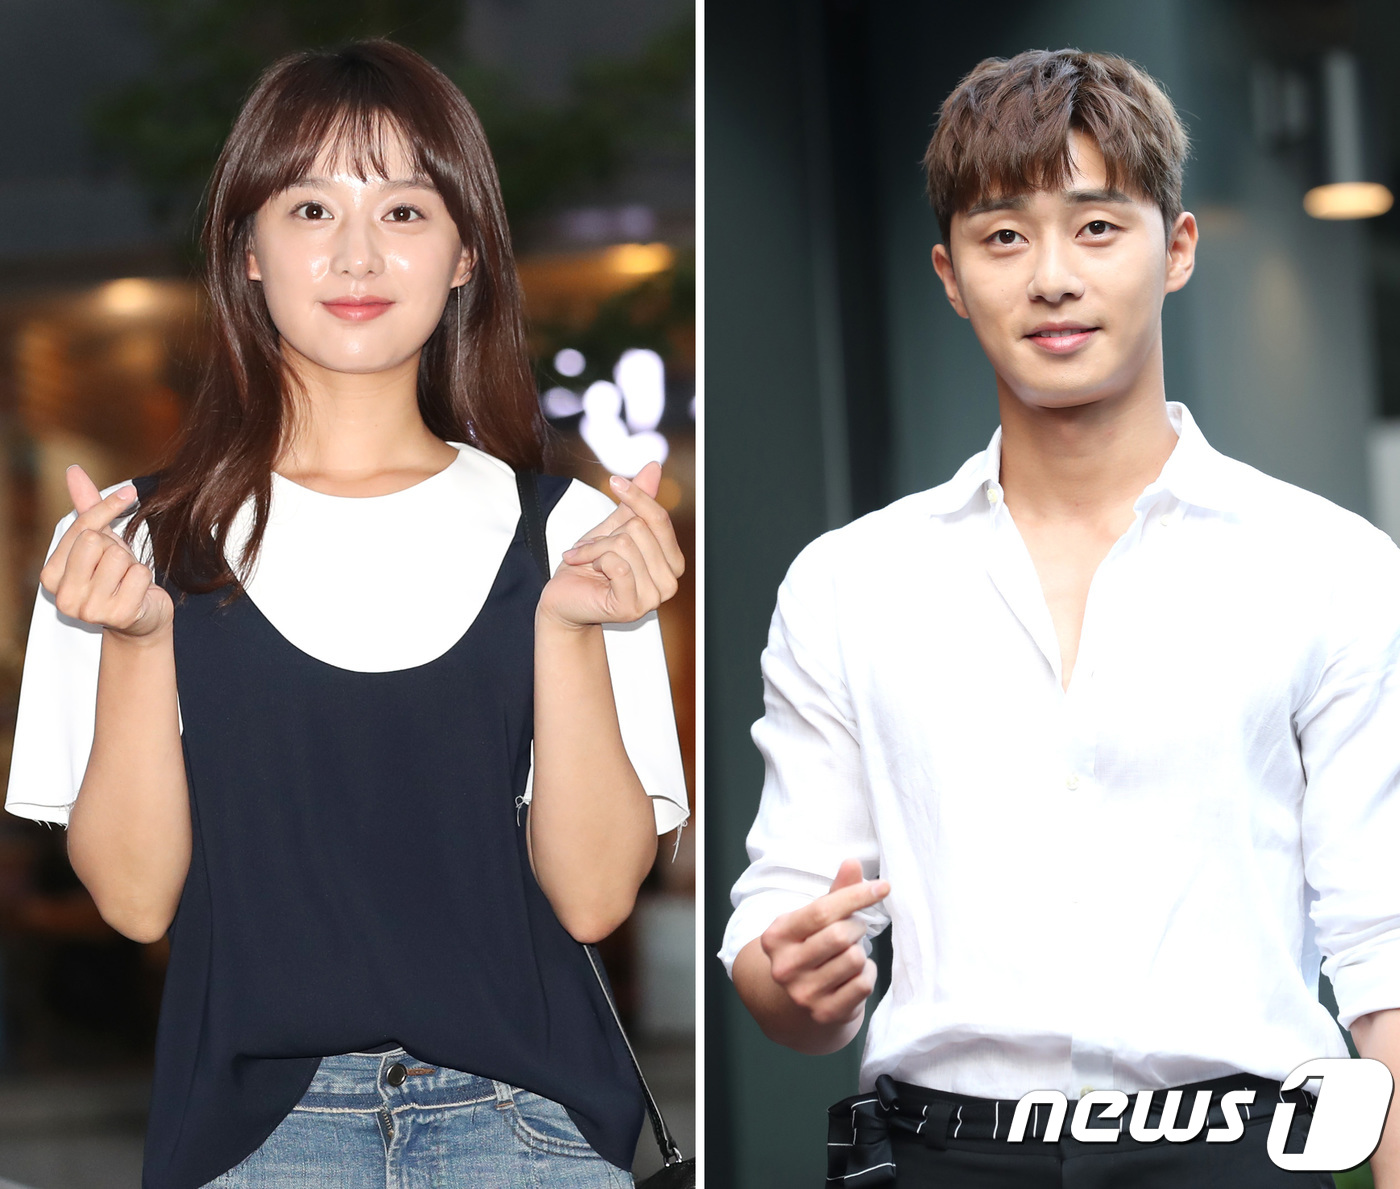 Park Seo Joon Kim Ji Won Ahn Jae Hong Song Ha Yoon and others